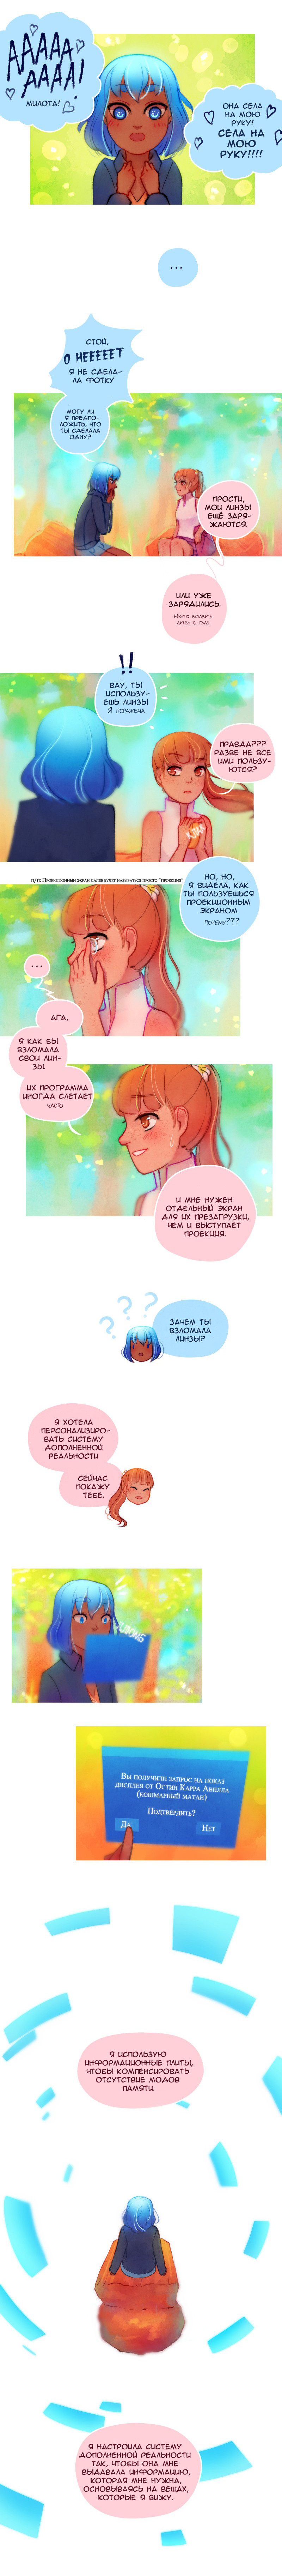 https://r1.ninemanga.com/comics/pic2/31/32415/333529/1504974466983.jpg Page 2